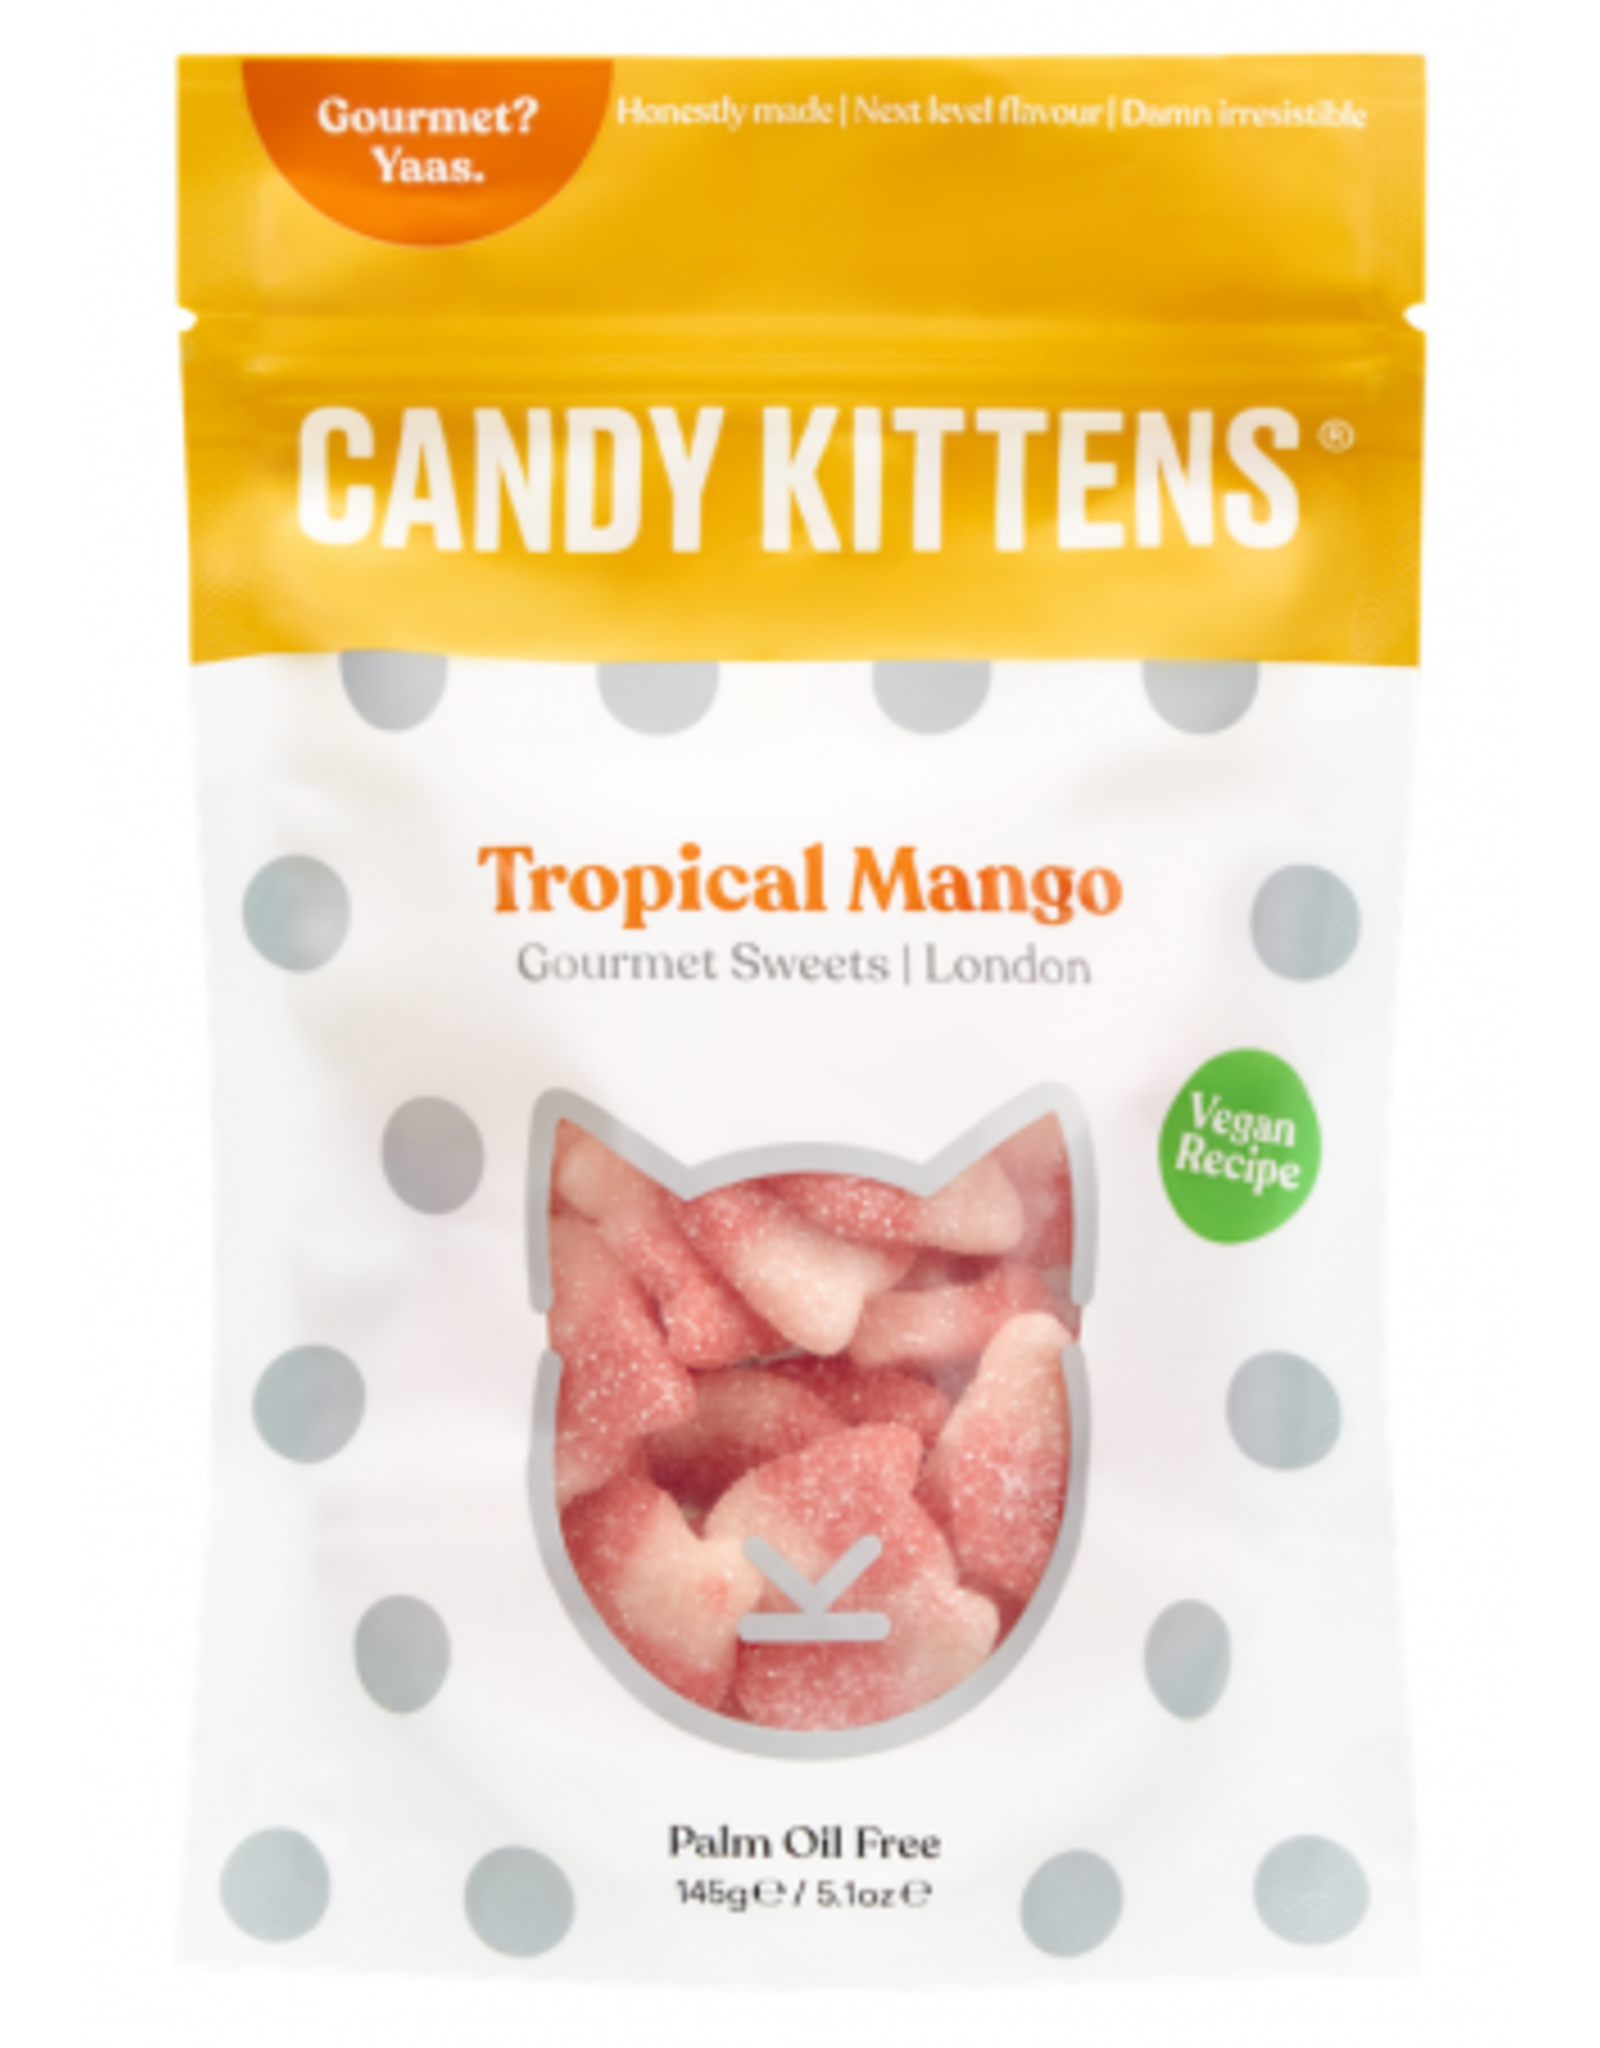 Candy Kittens Candy Kittens Tropical Mango 125g